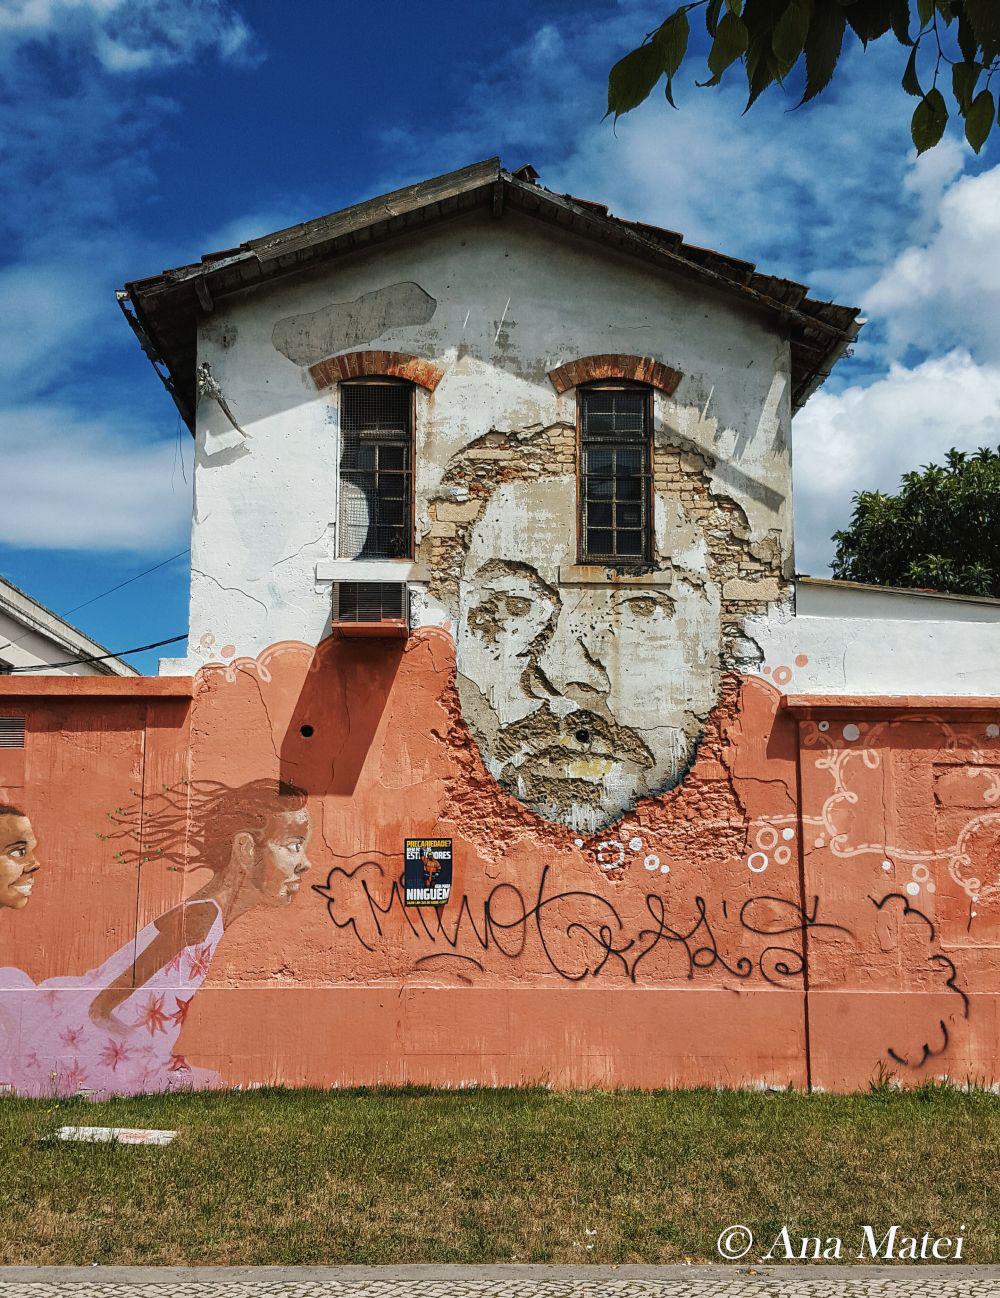 Vhils-street-art-Rua-de-Alcantara,-Lisbon---pic-by-Ana-Matei